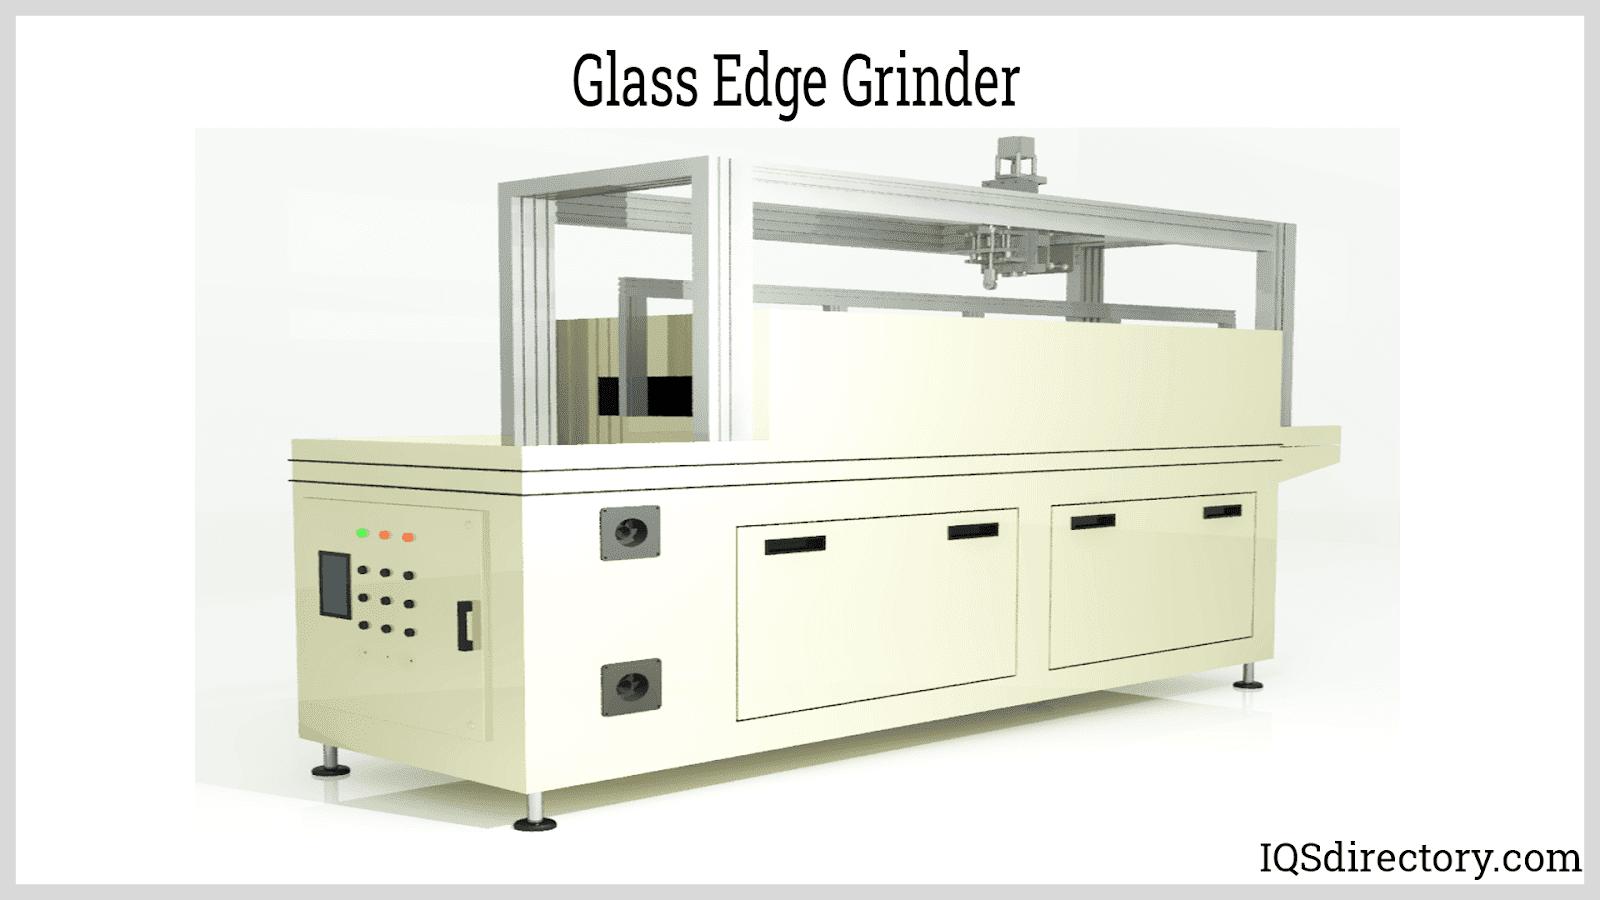 Glass Edge Grinder